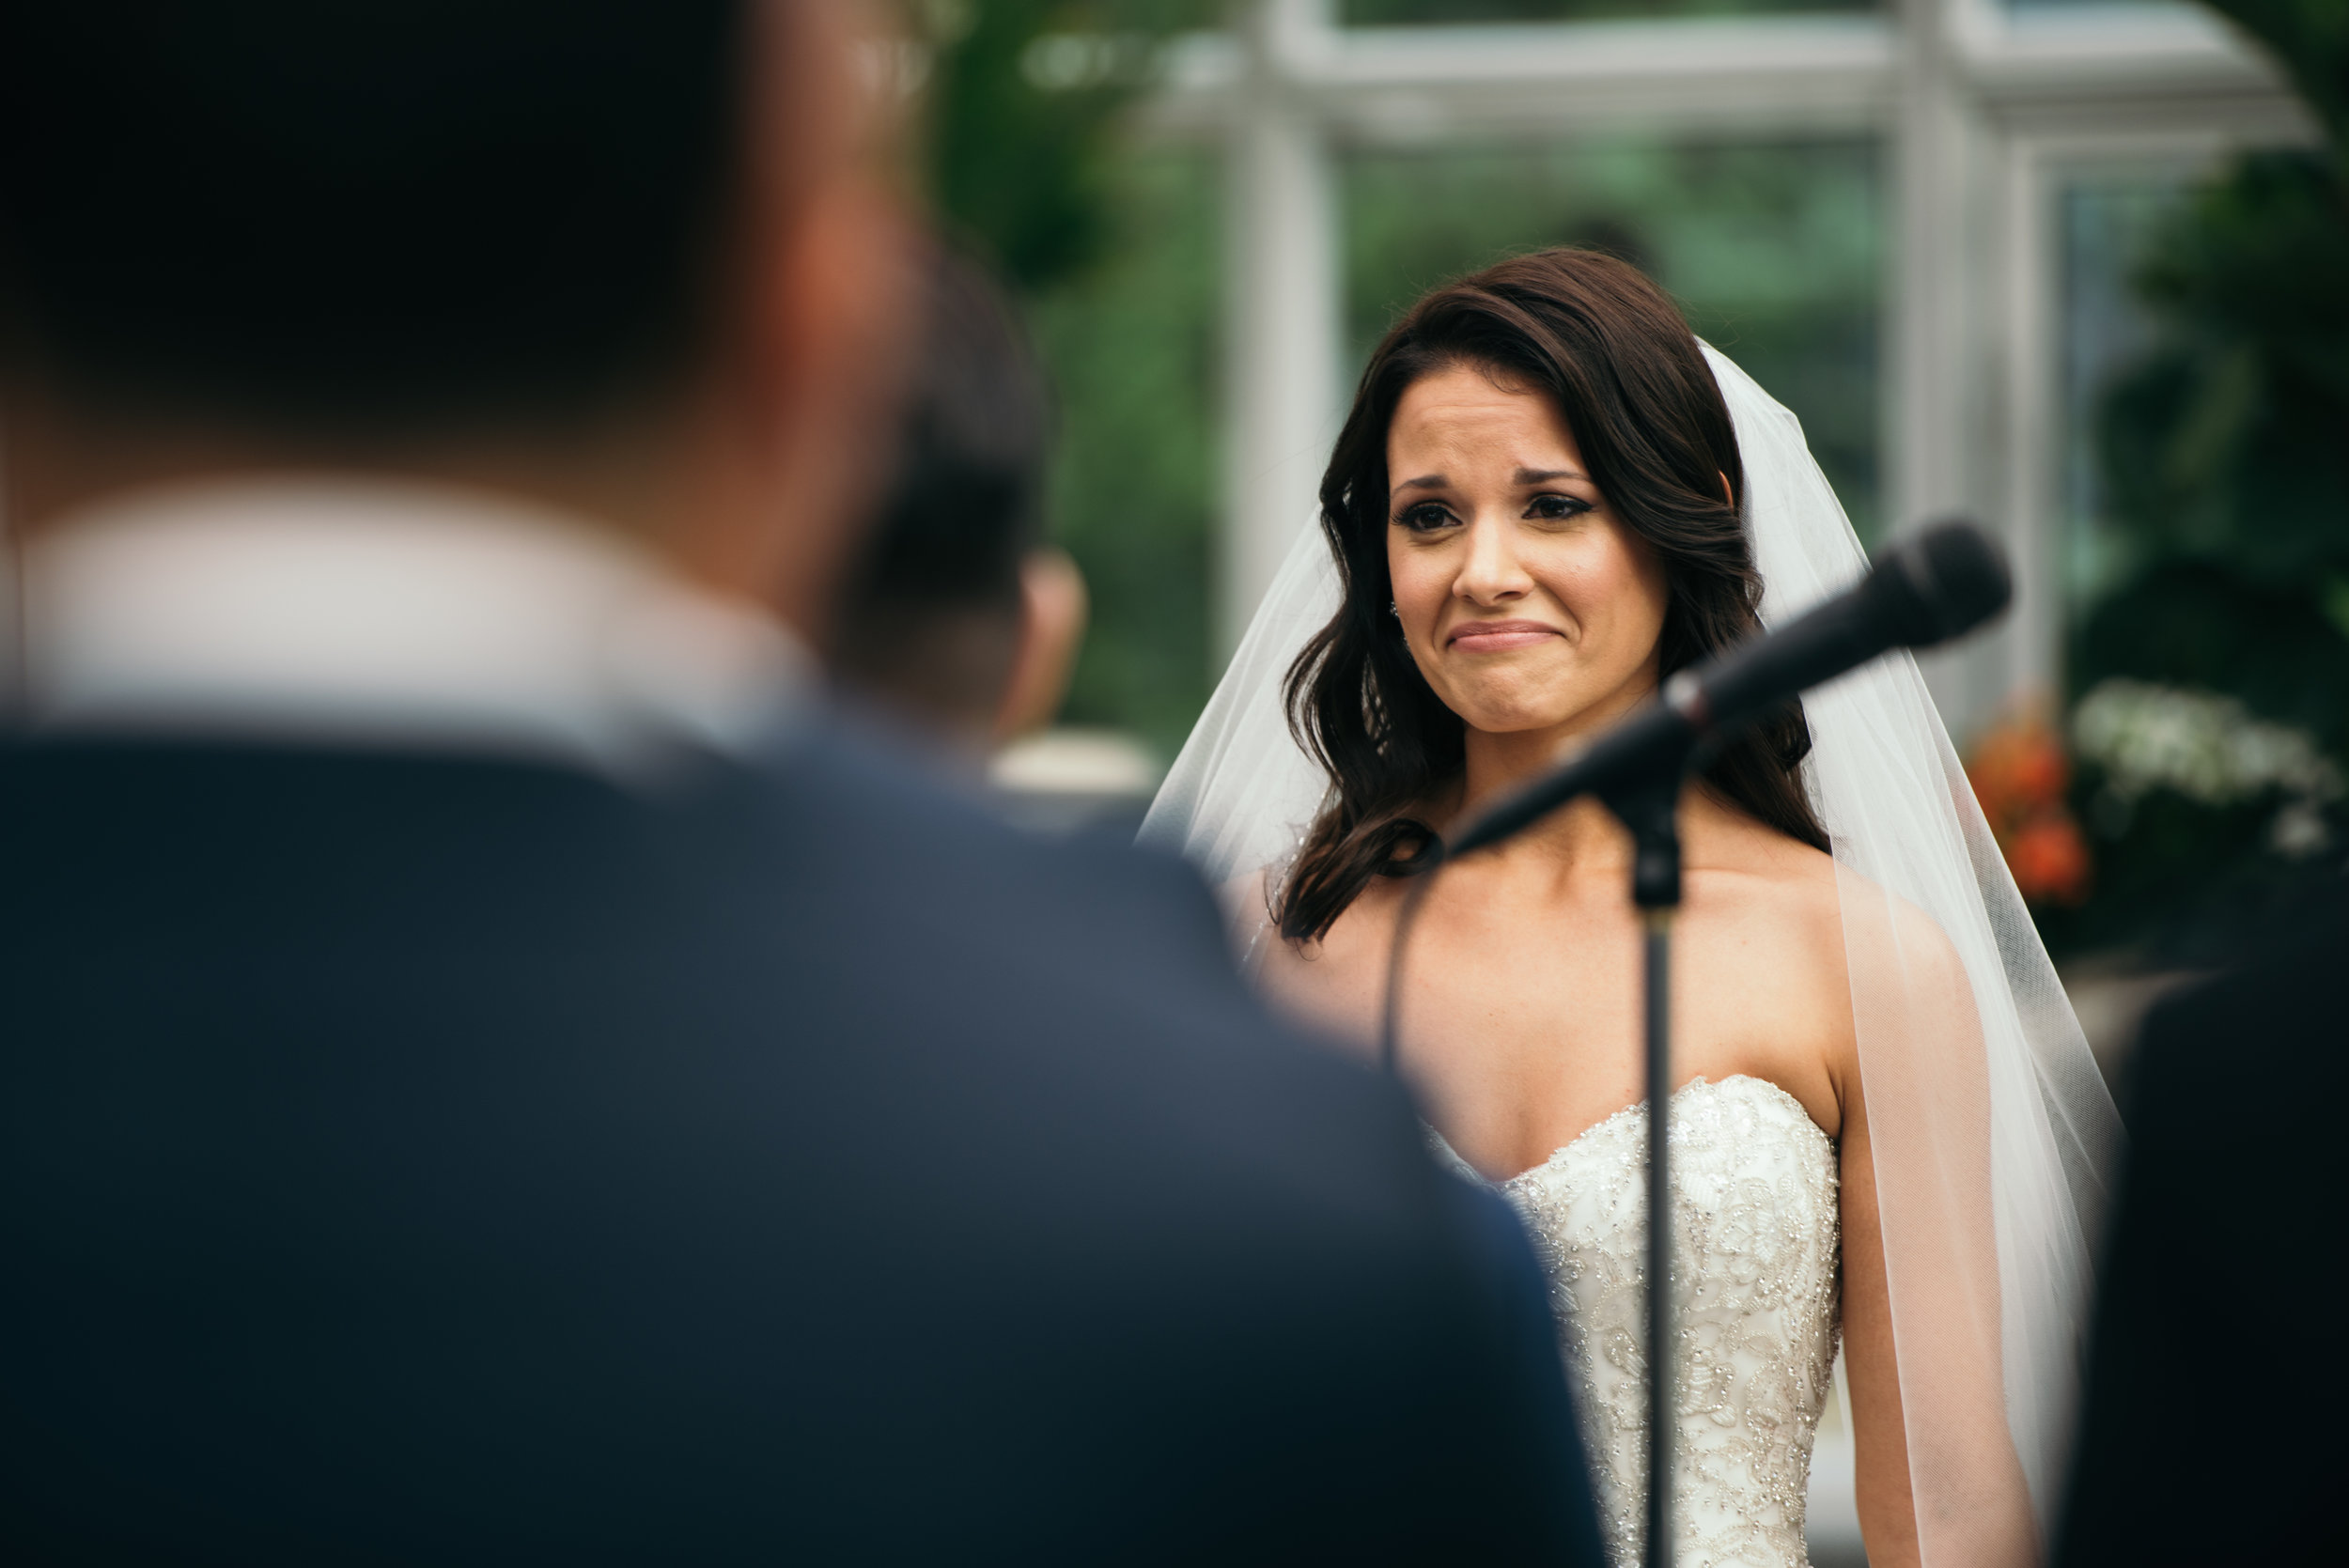 WeddingPhotos | NJPhotographer | Highlights-8-20.jpg